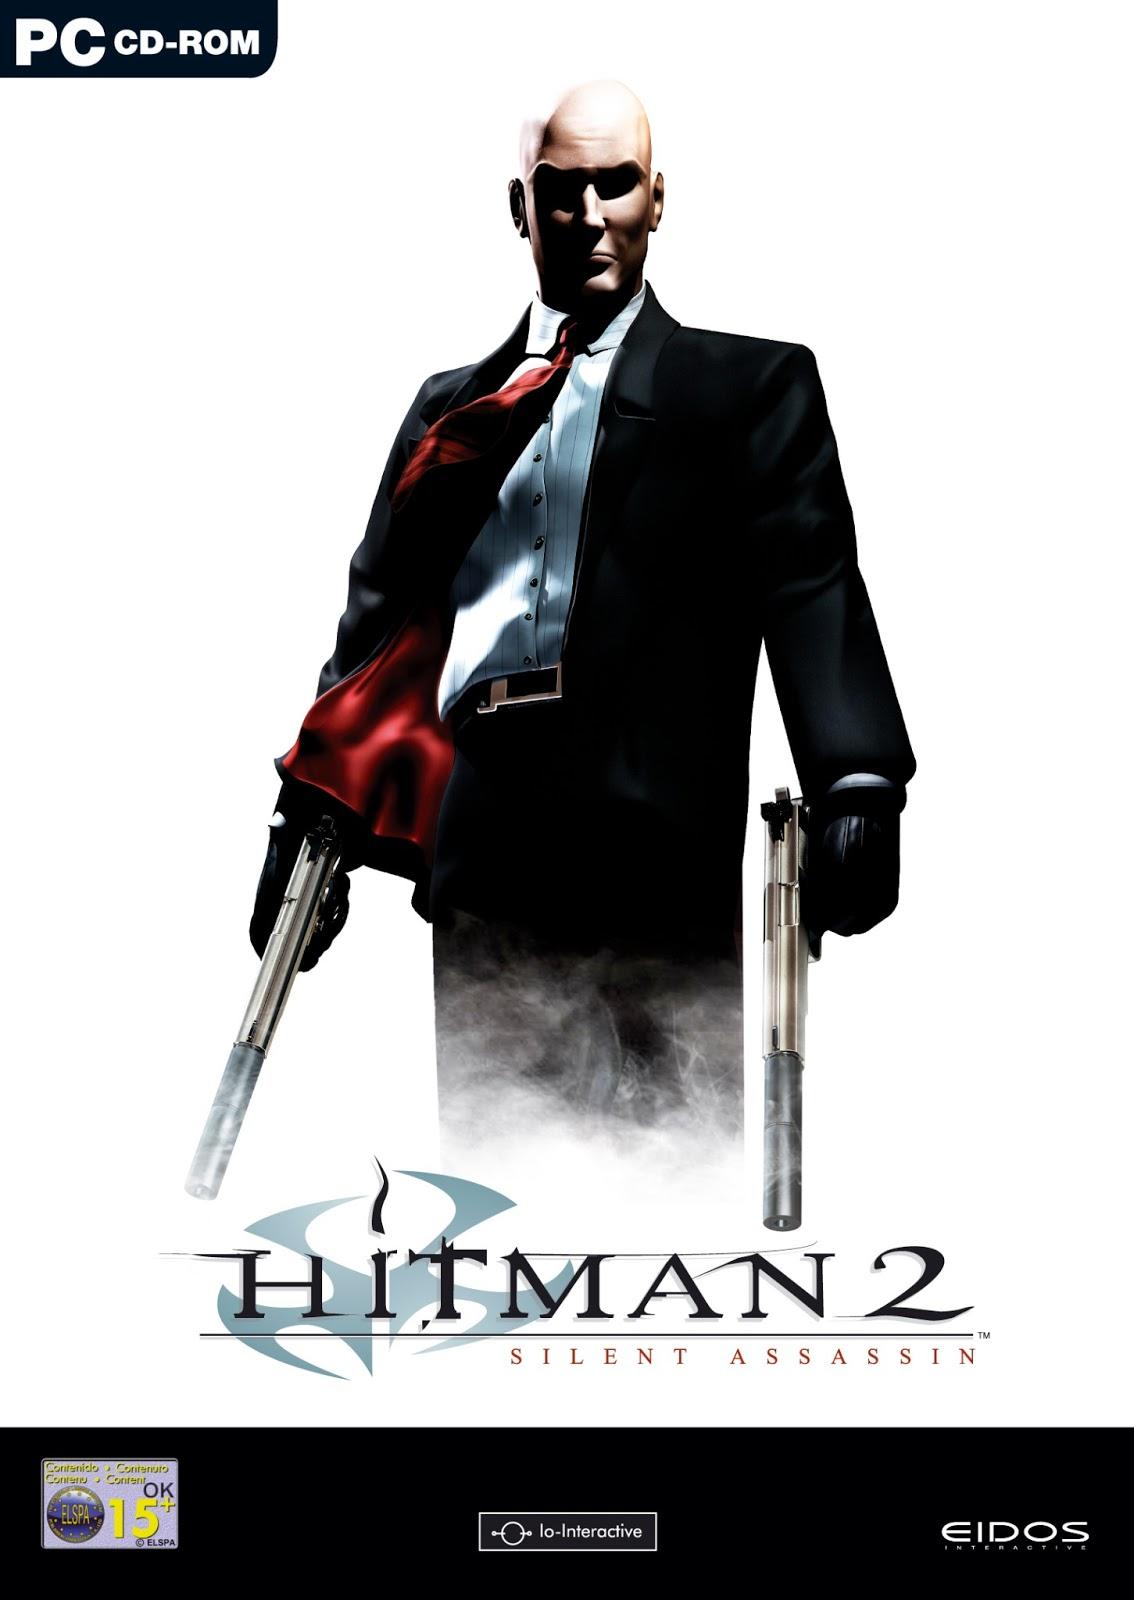 Nice wallpapers Hitman 2: Silent Assassin 1134x1600px